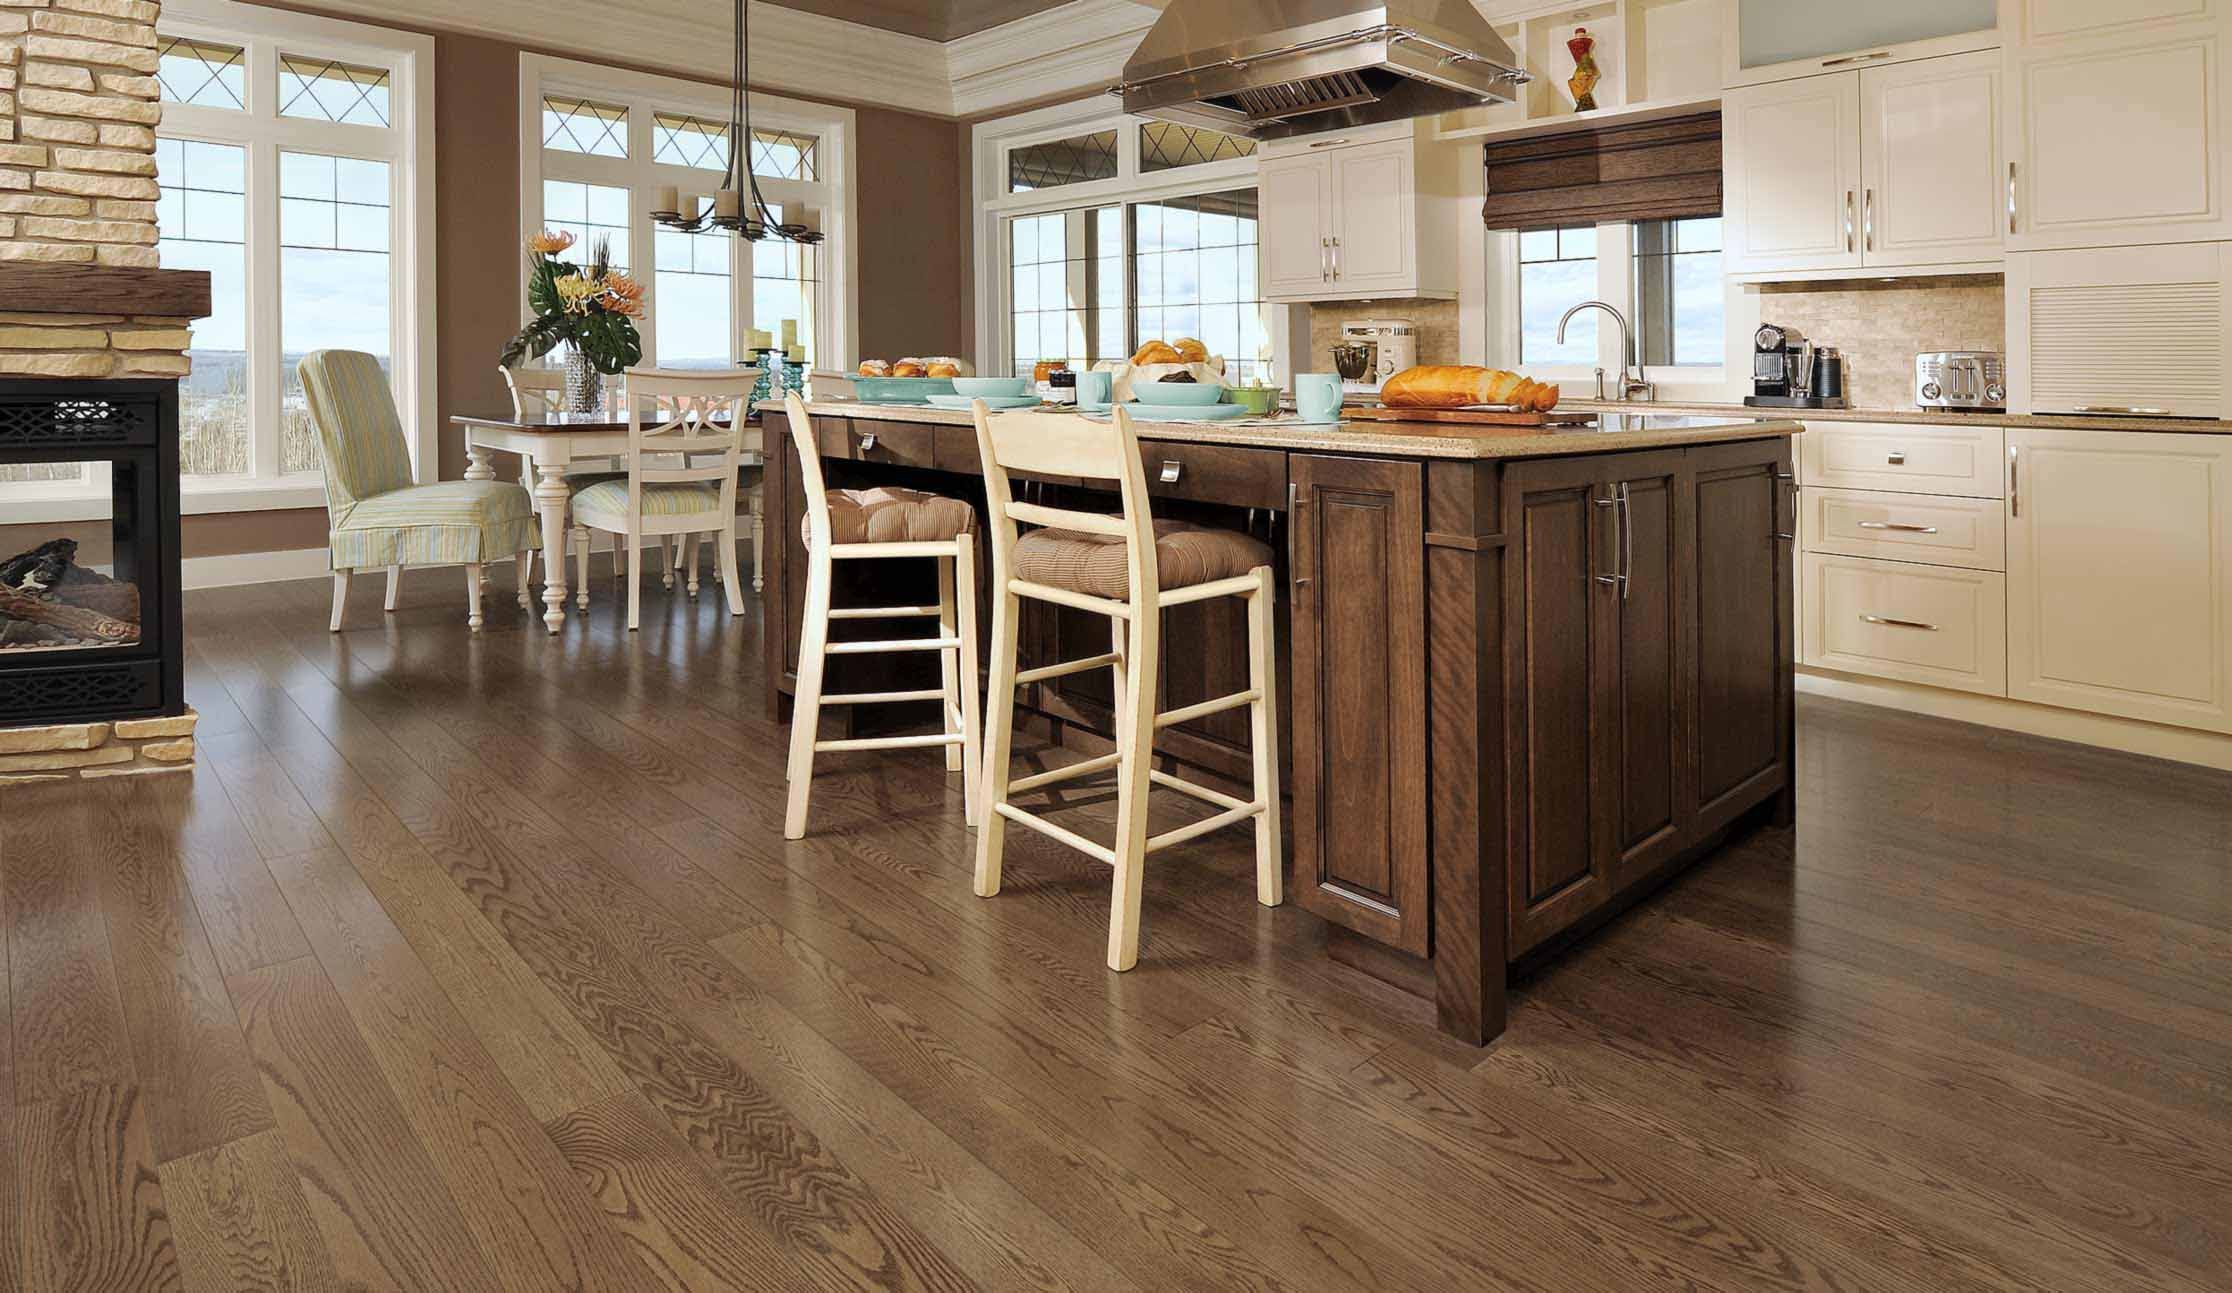 Red Oak Savanna Mirage Hardwood Flooring Call For